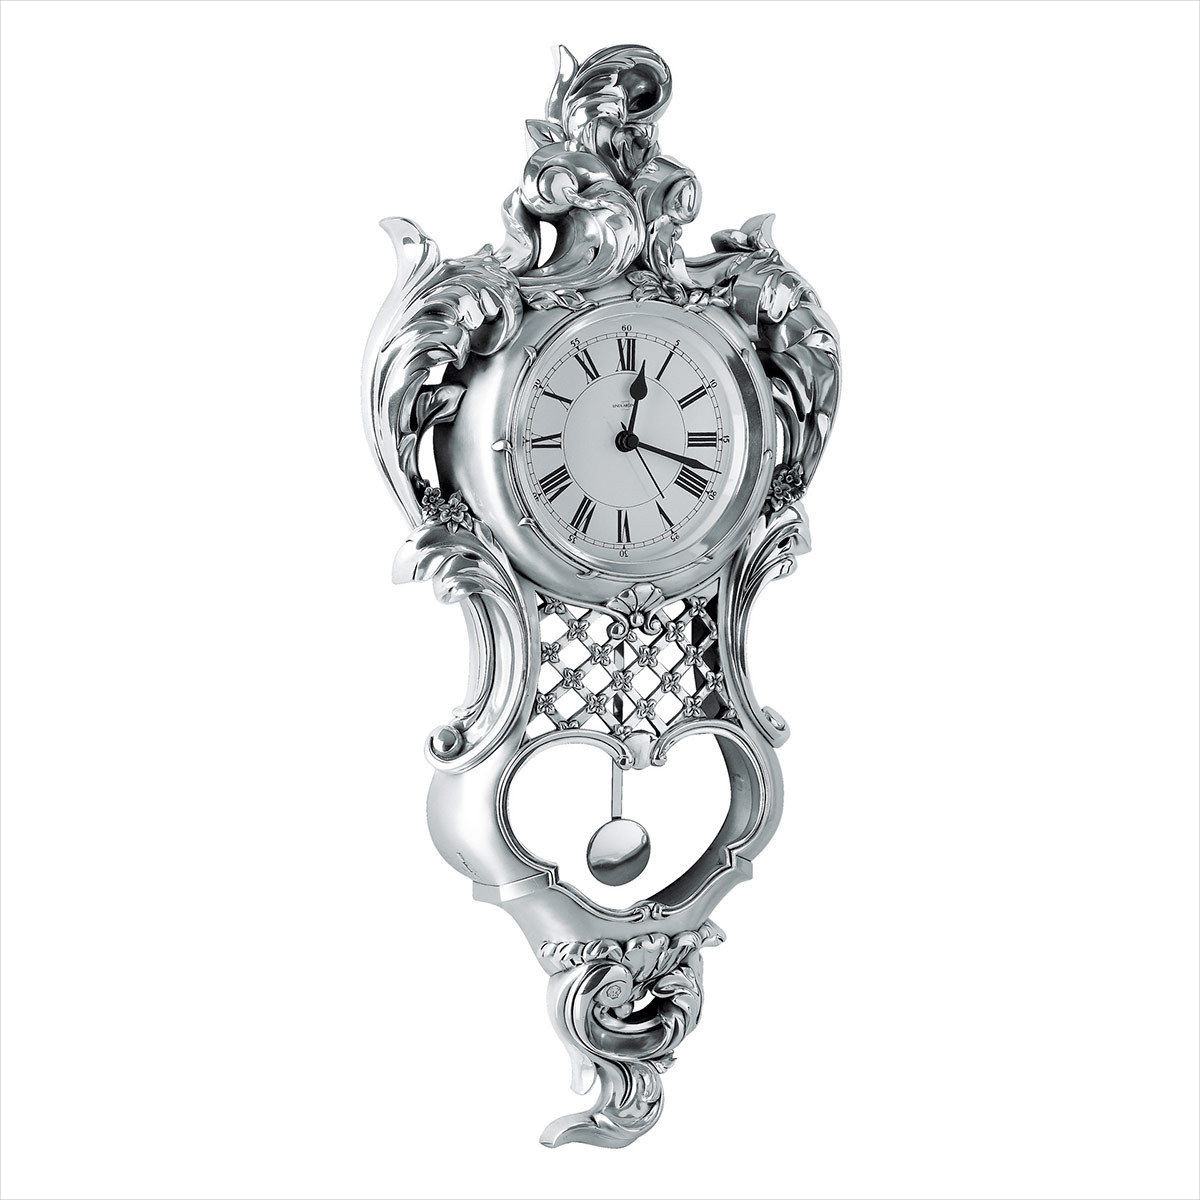 Silver Pendulum Wall Clock